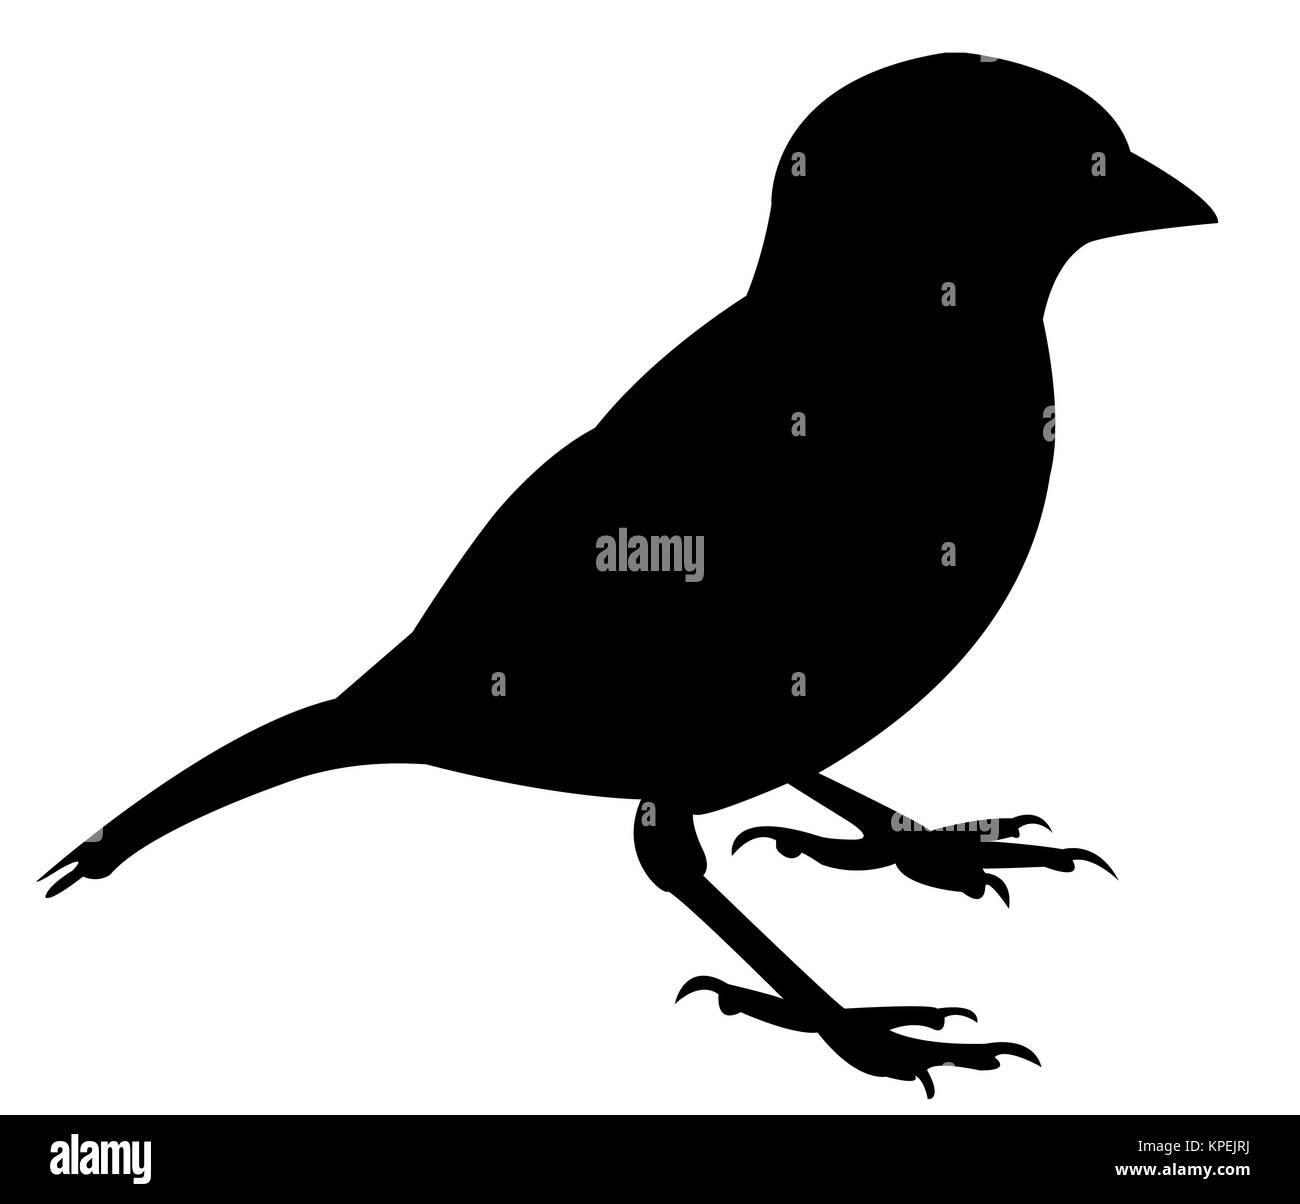 a sparrow silhouette vector - Stock Image